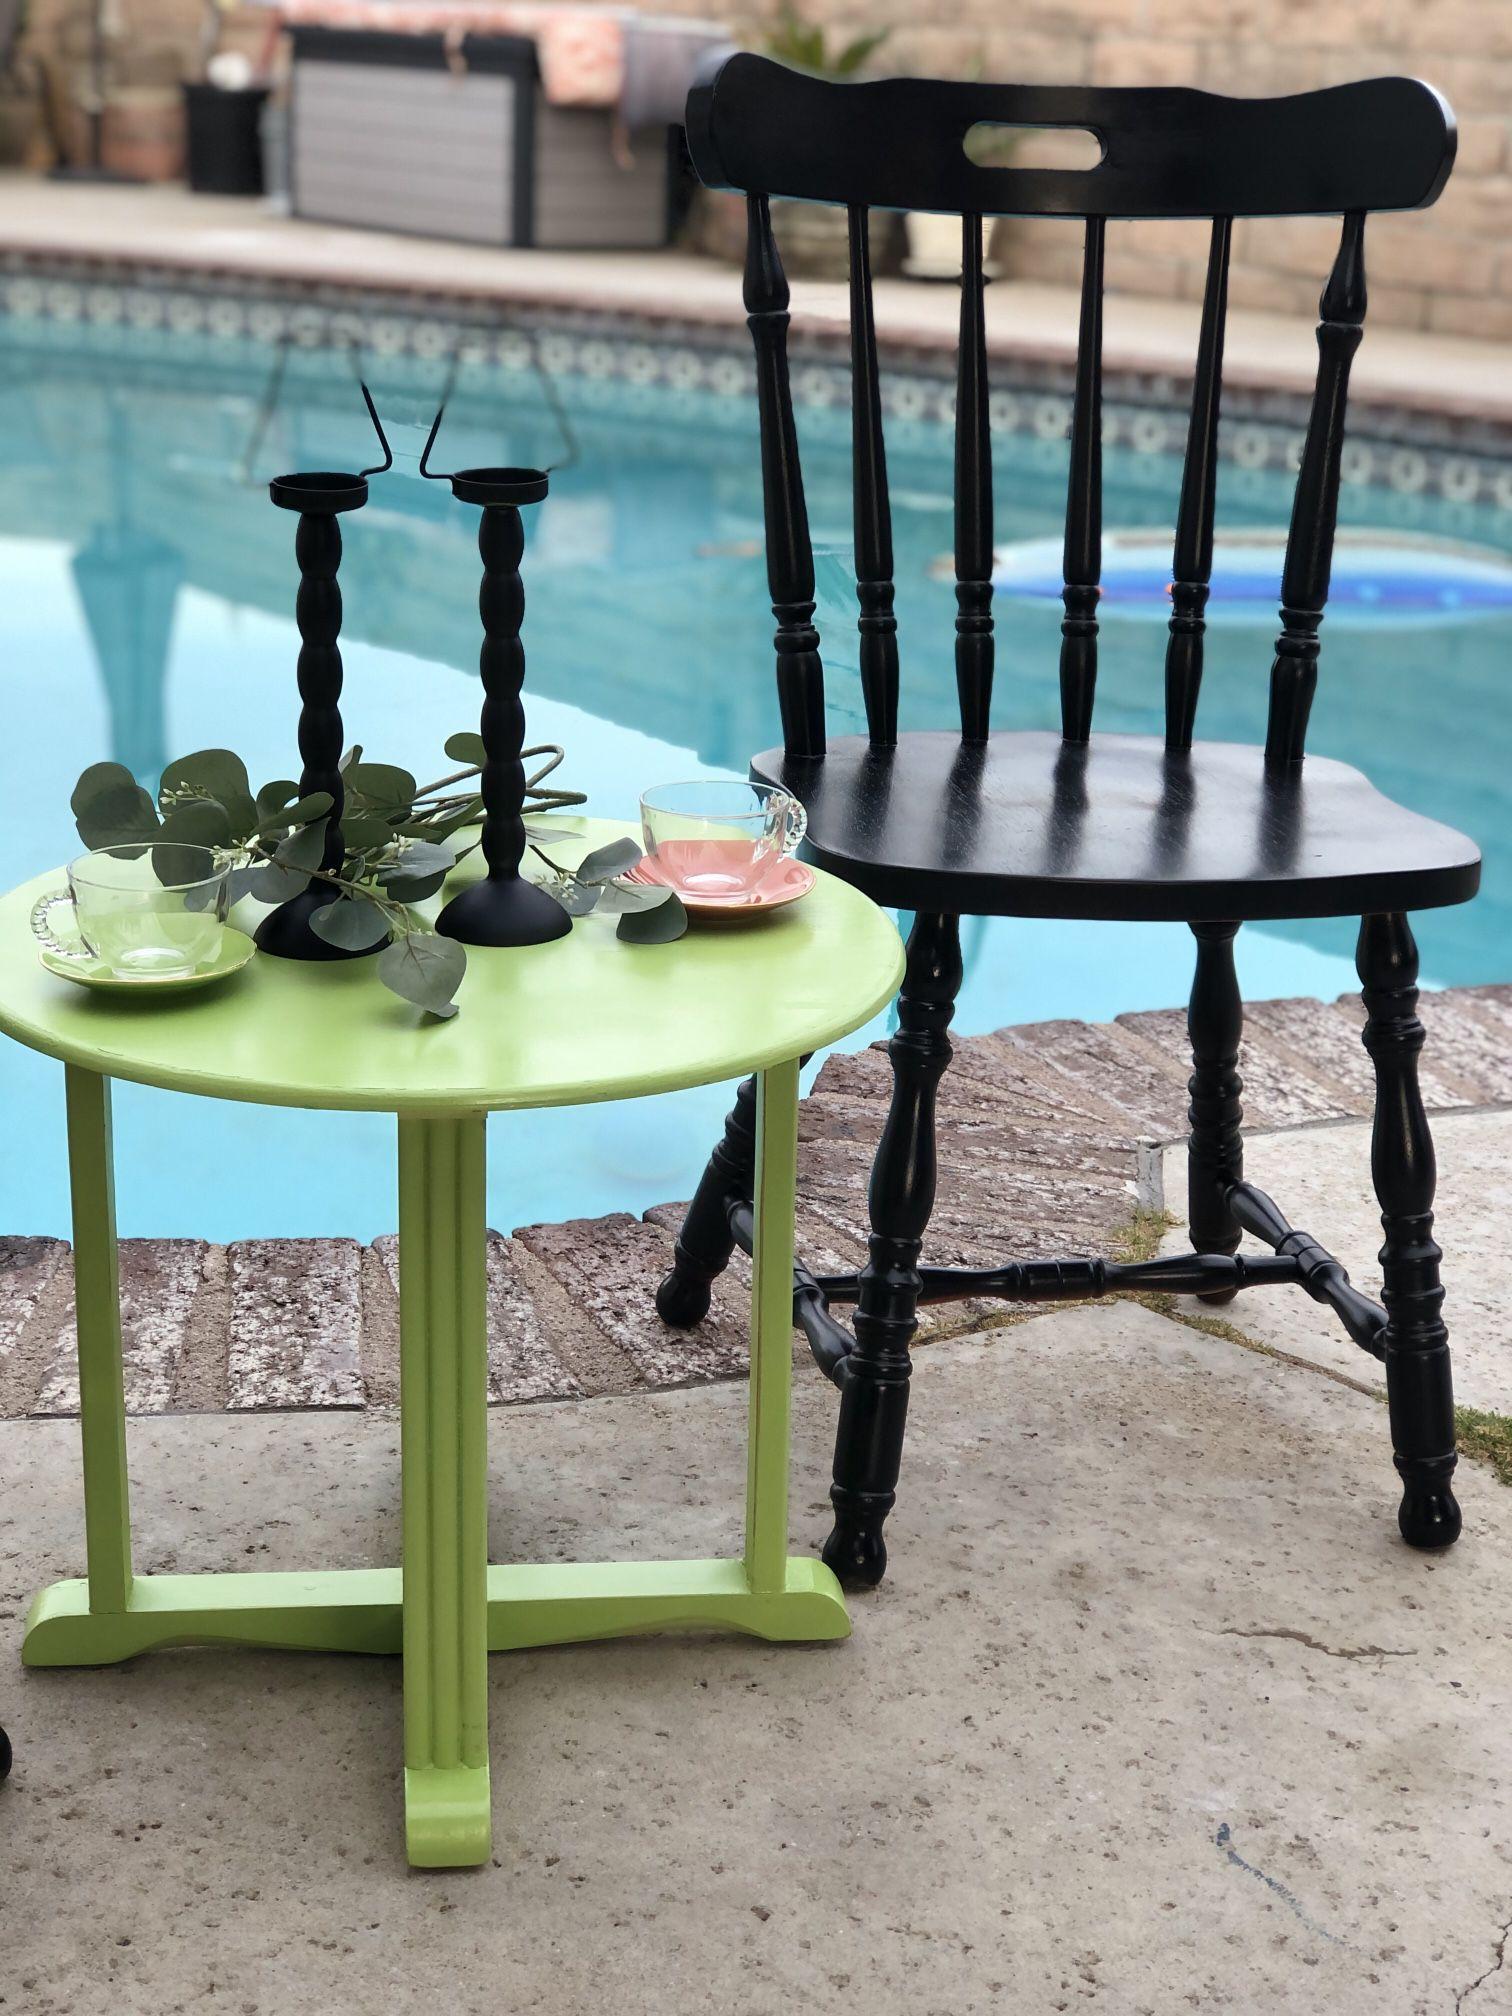 Adorable Patio Set For Summer!